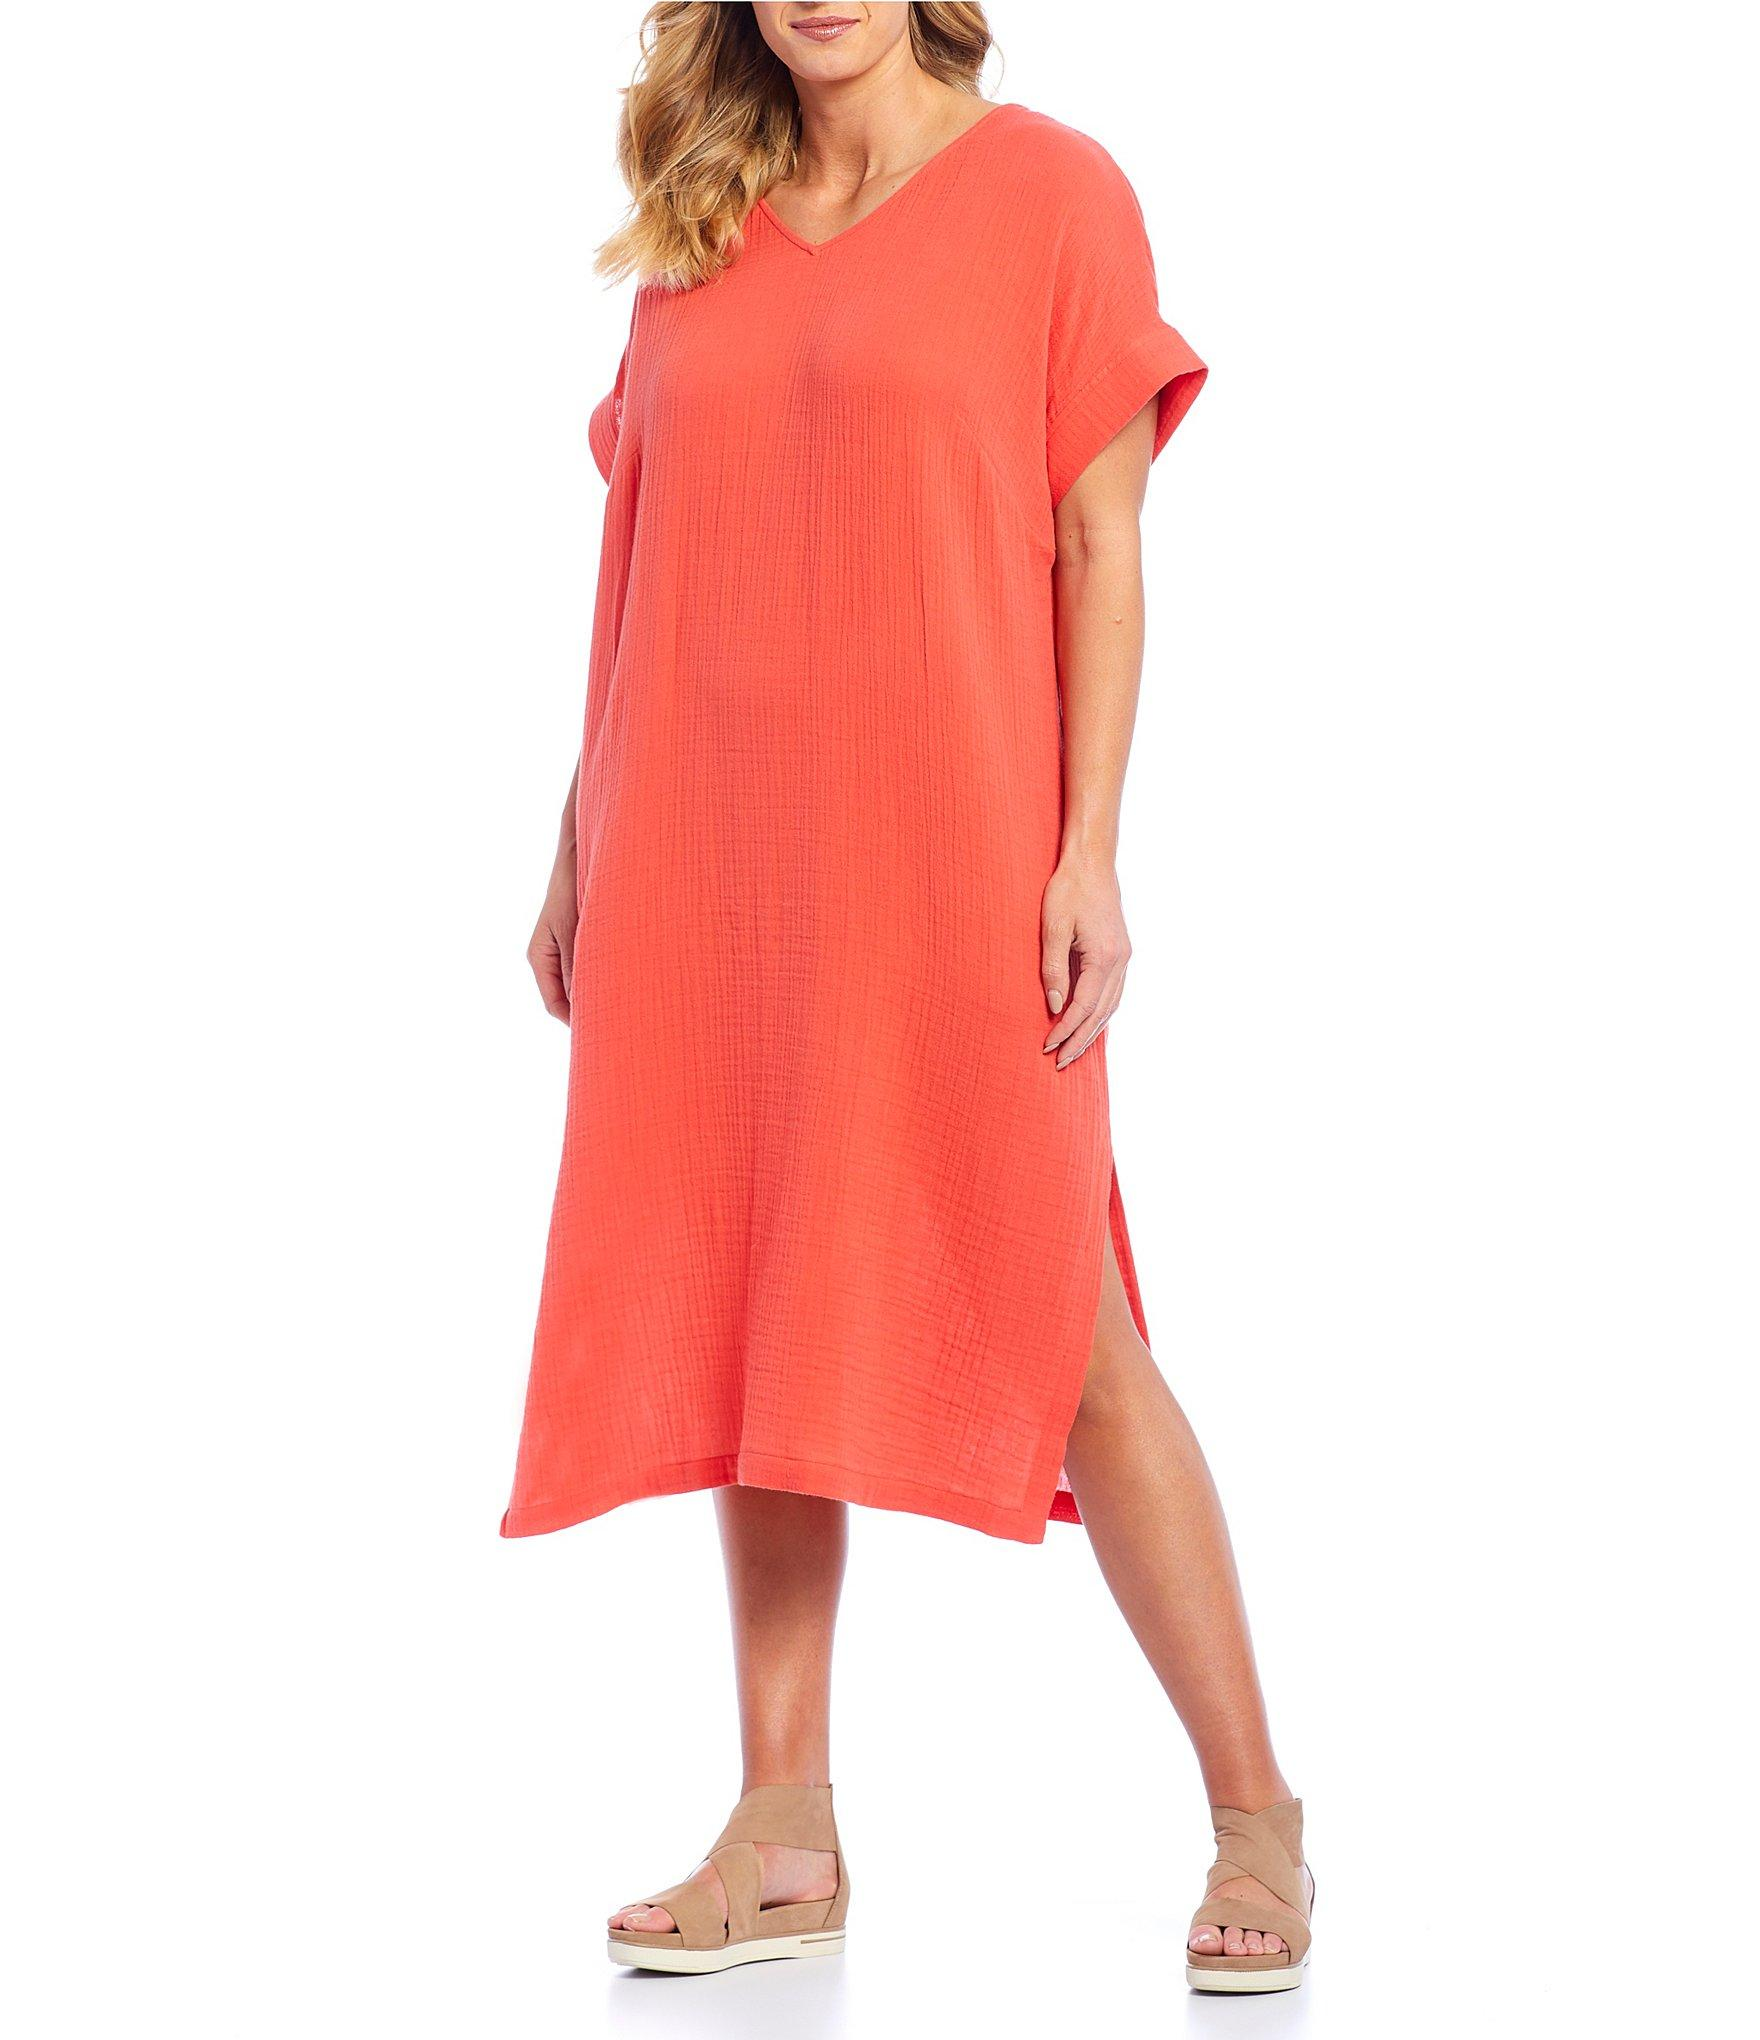 63f81217ba1 Lyst - Eileen Fisher Plus Size V-neck Side Slit Midi Dress in Red